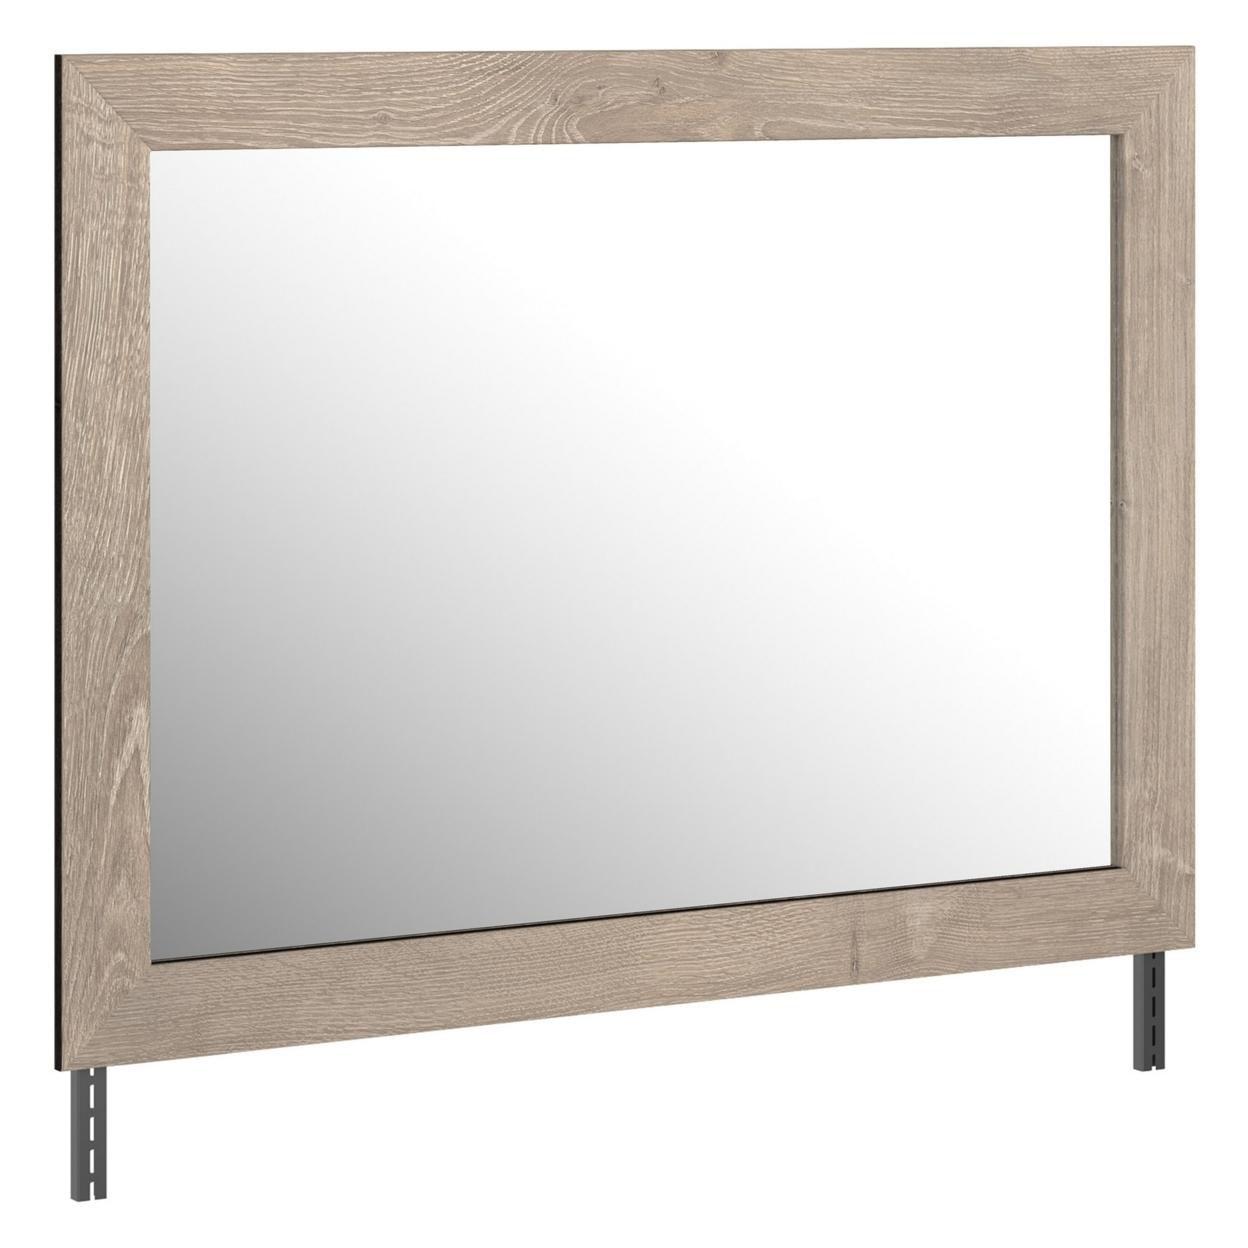 Bedroom Mirror with Grains and Rectangular Encasing, Oak Brown, Saltoro Sherpi